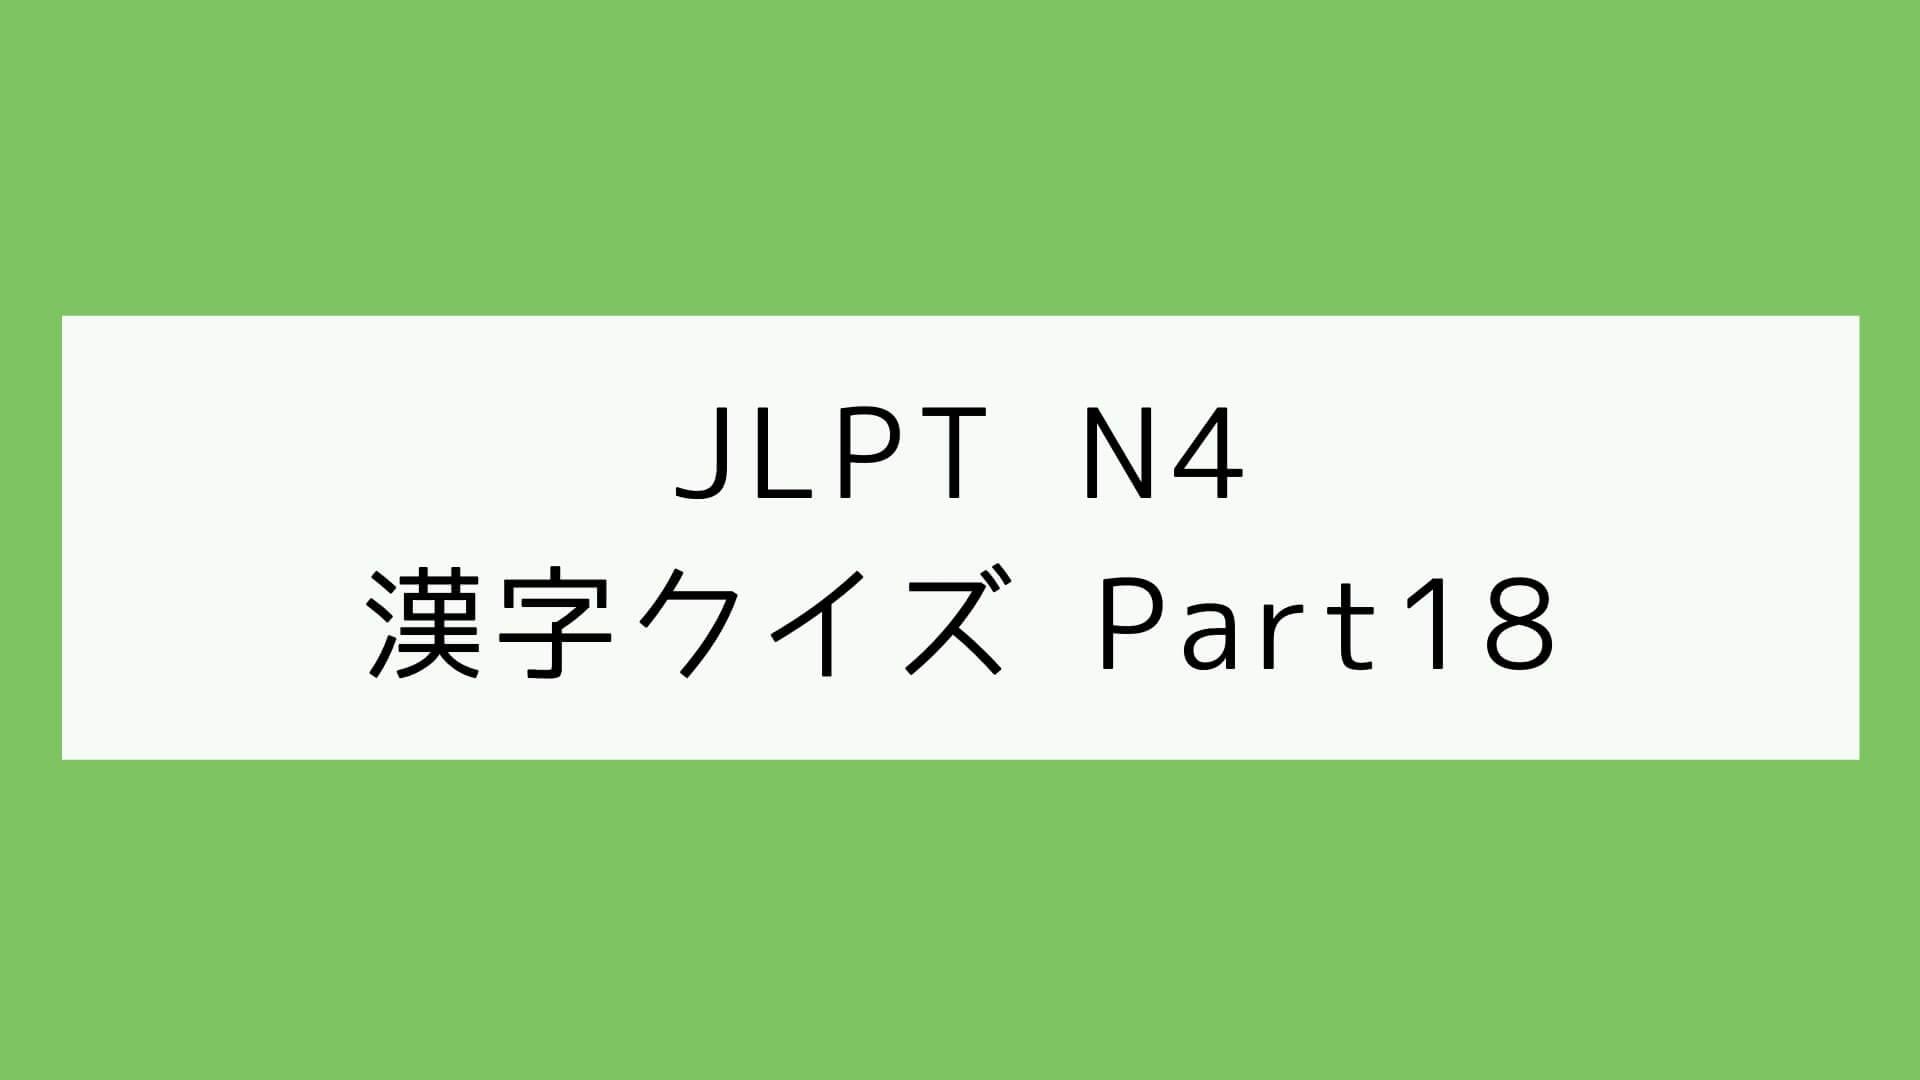 【JLPT N4】漢字クイズ Part18